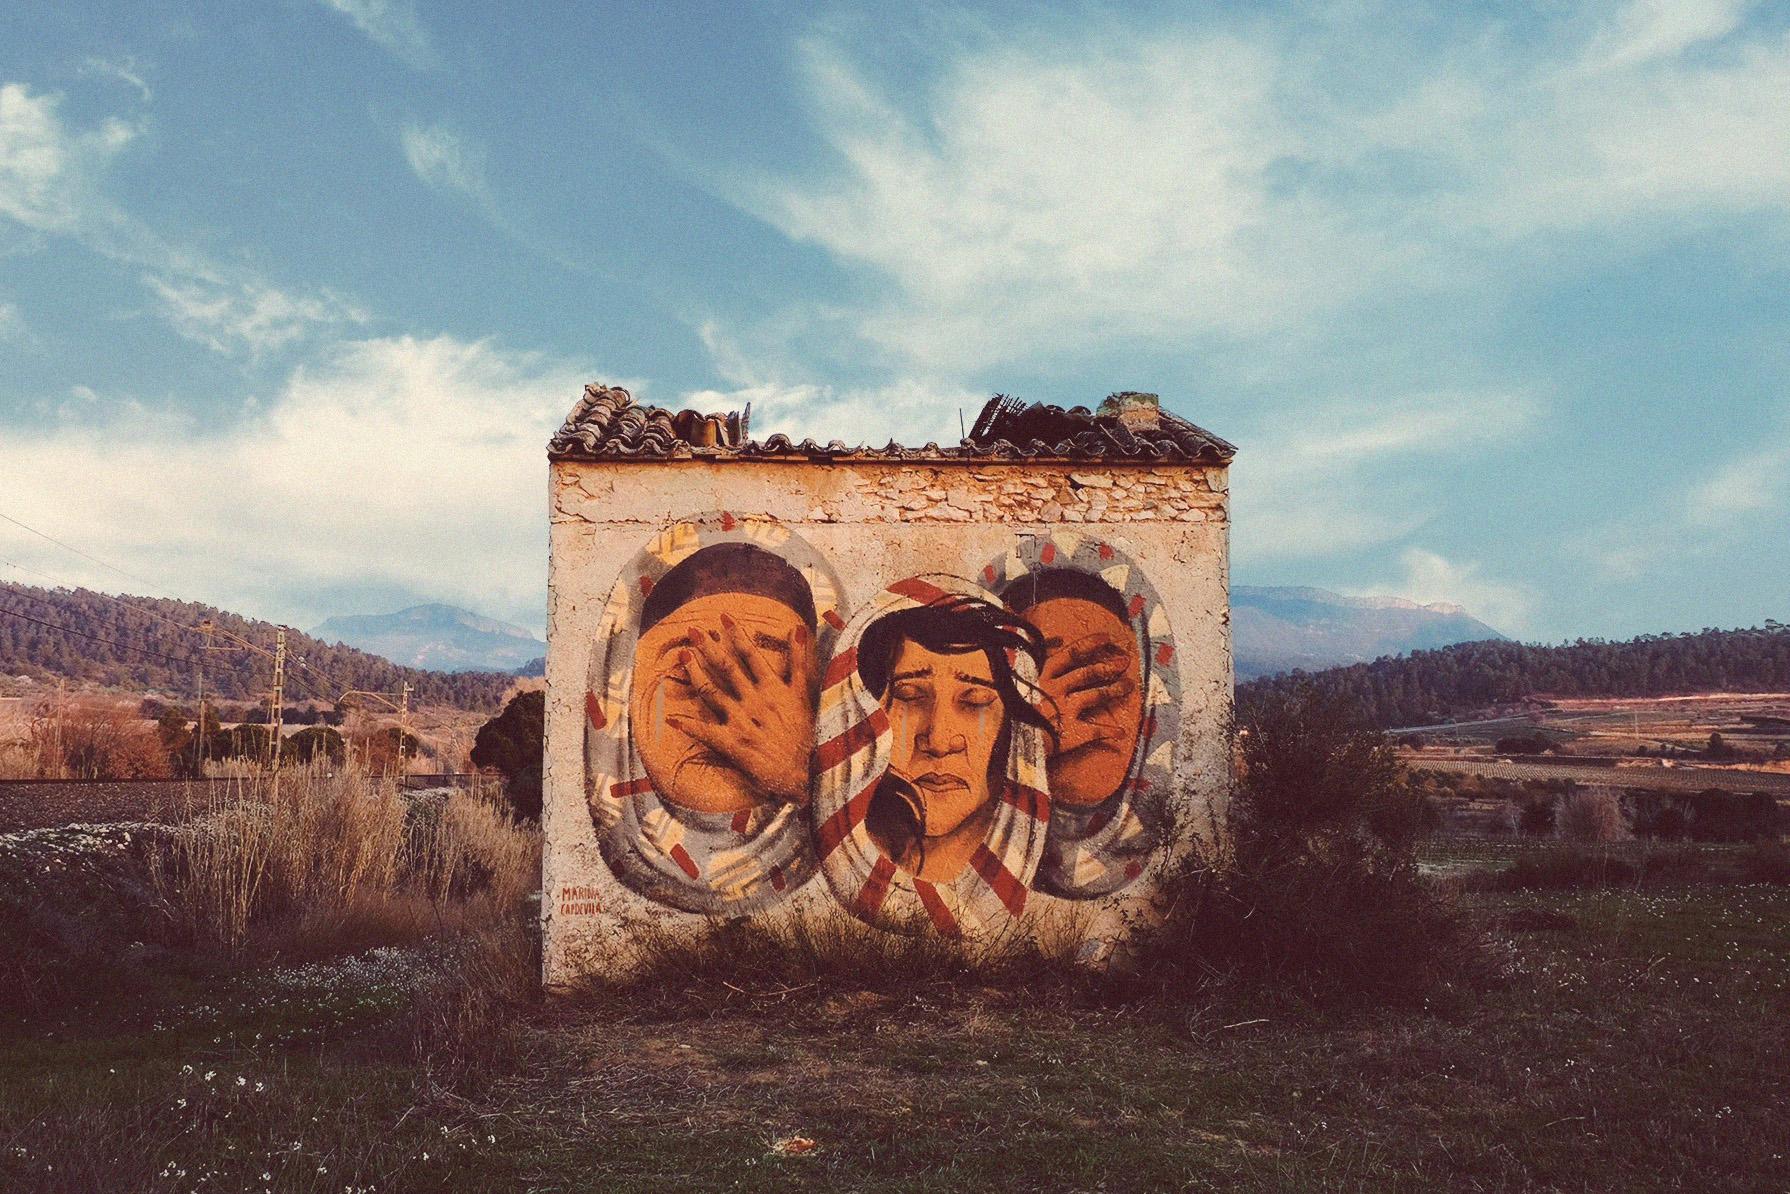 Refugees, mural painted at Marçà, Priorat, Spain 2017.